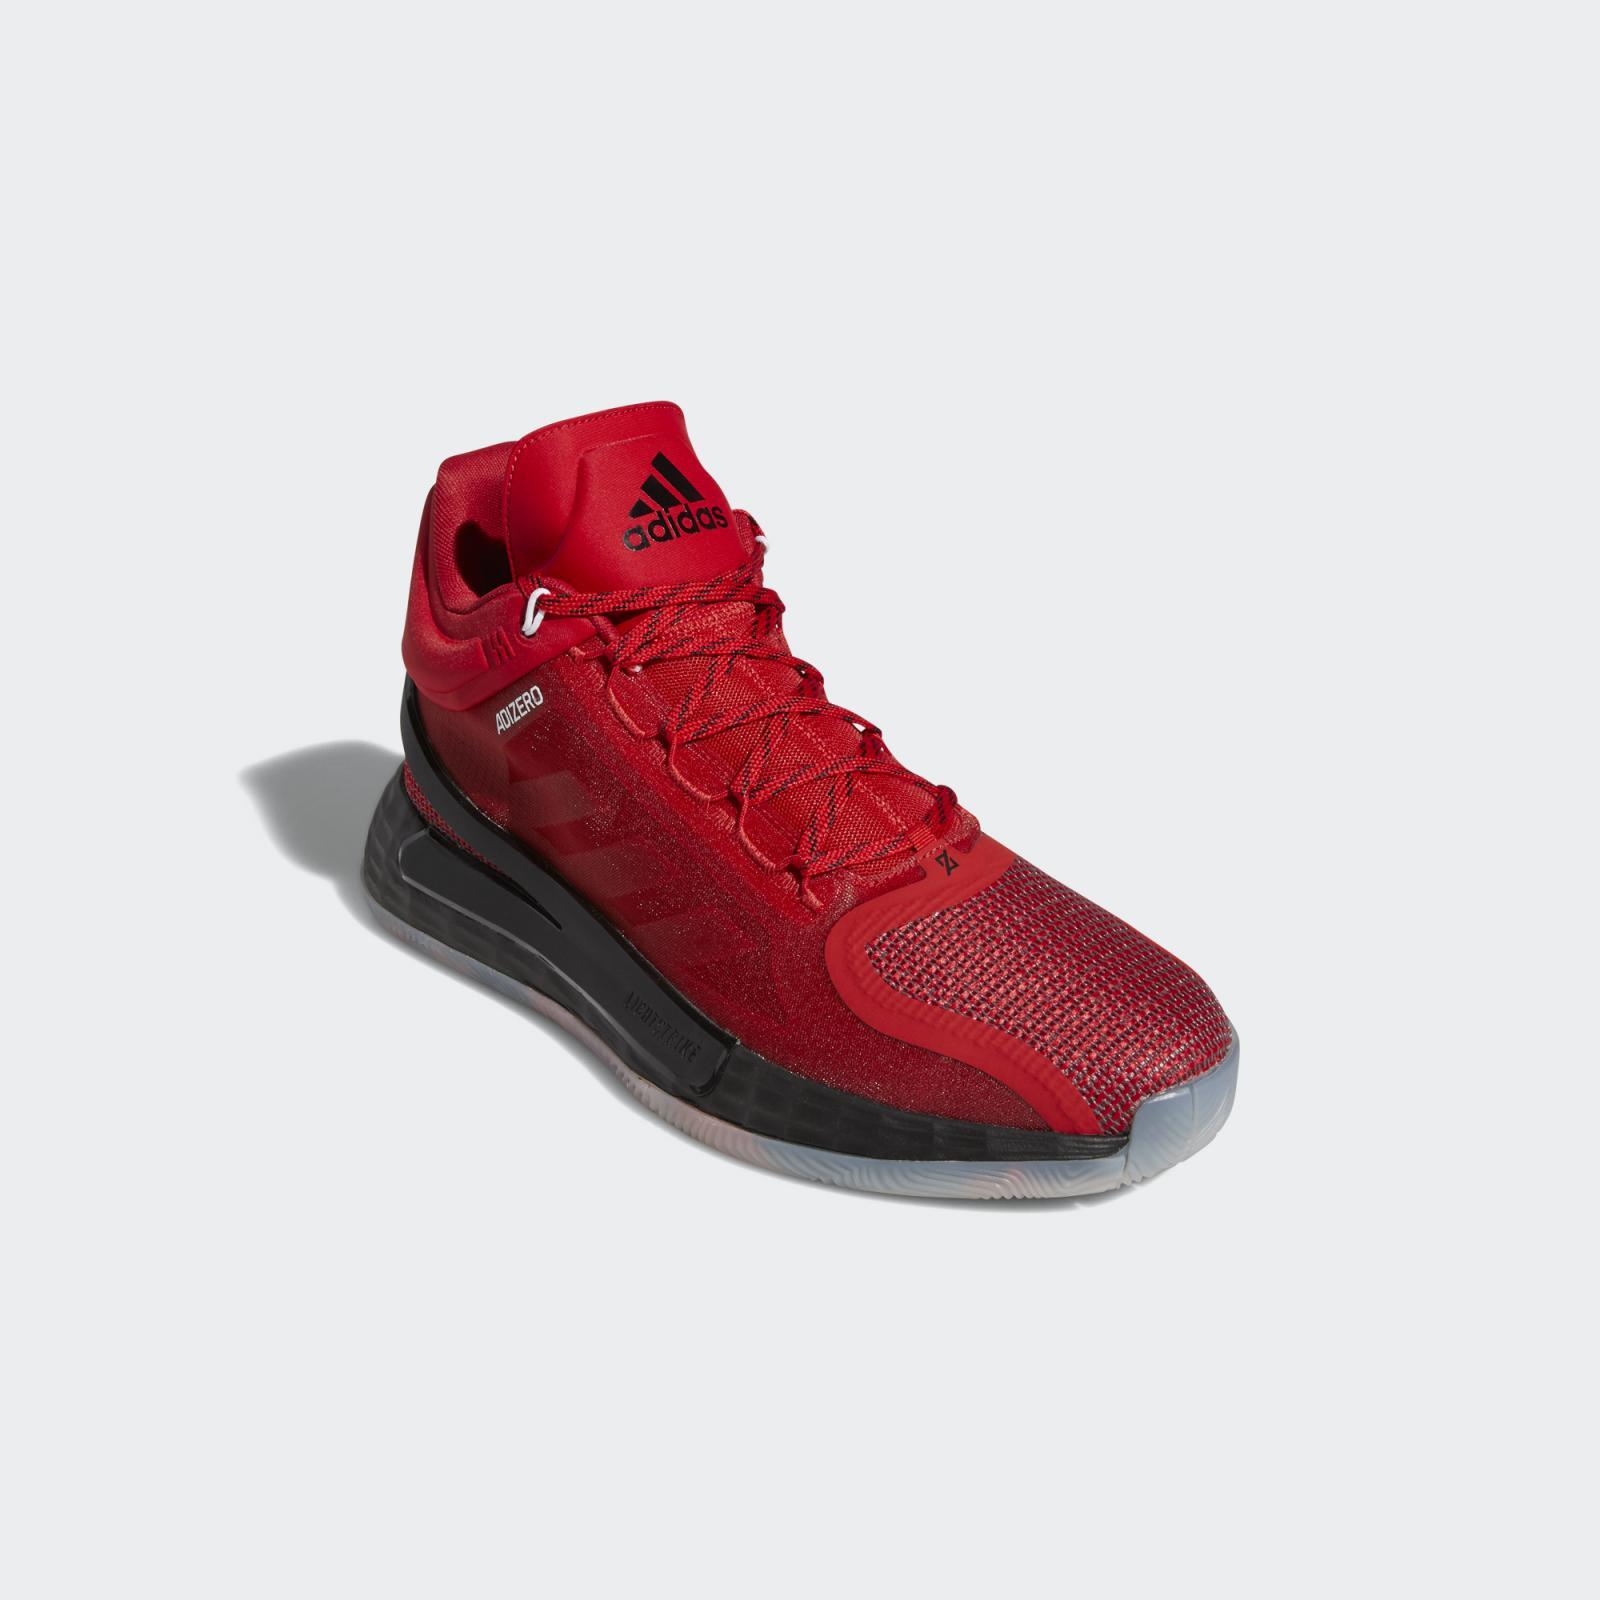 adidas Basketball推出全新浅猩红/一号黑/基督红色D Rose 11